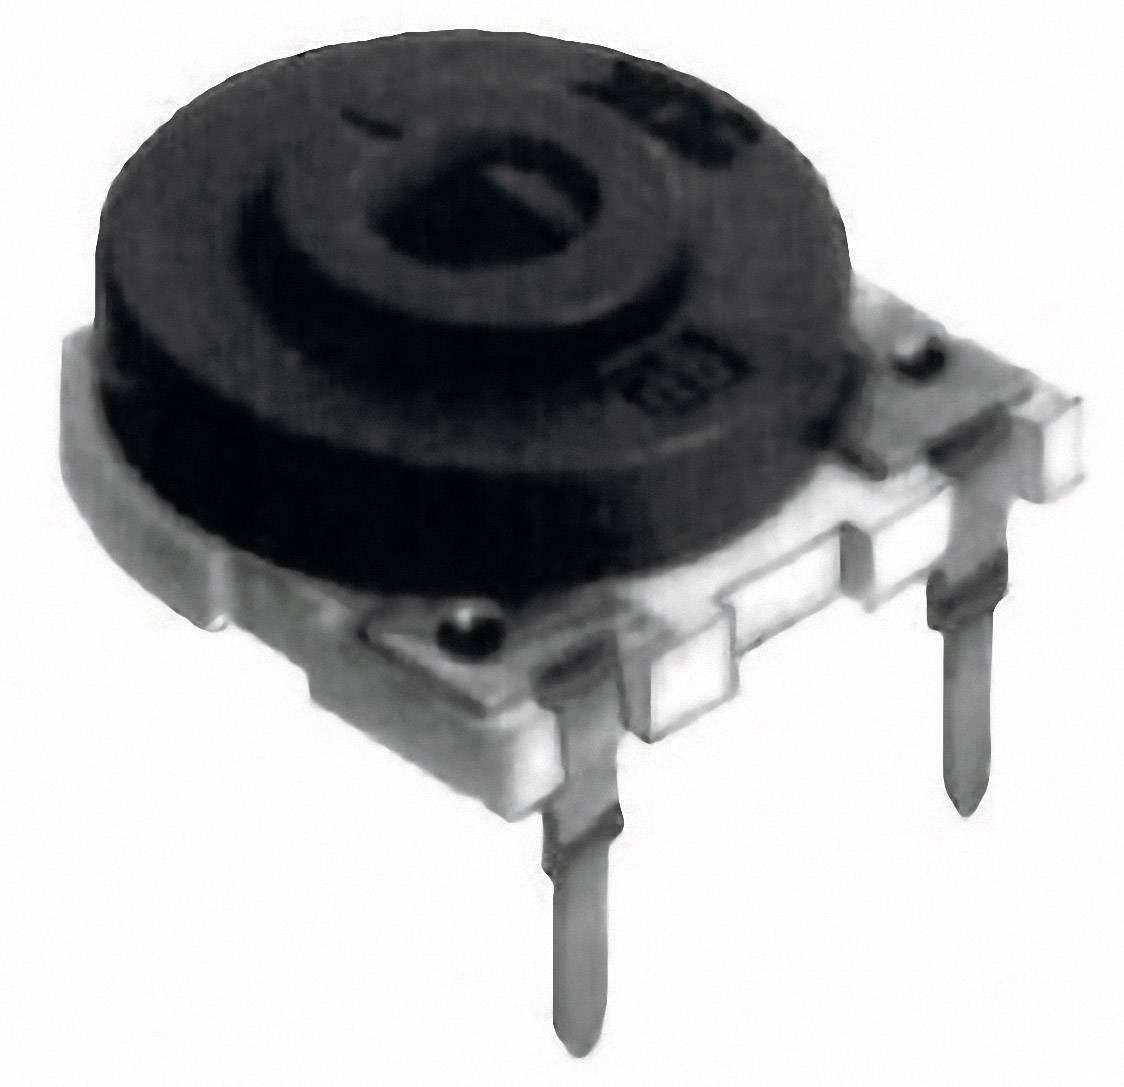 Cermetový trimer TT Electro, 2041461305, 4,7 kΩ, 0.5 W, ± 20%